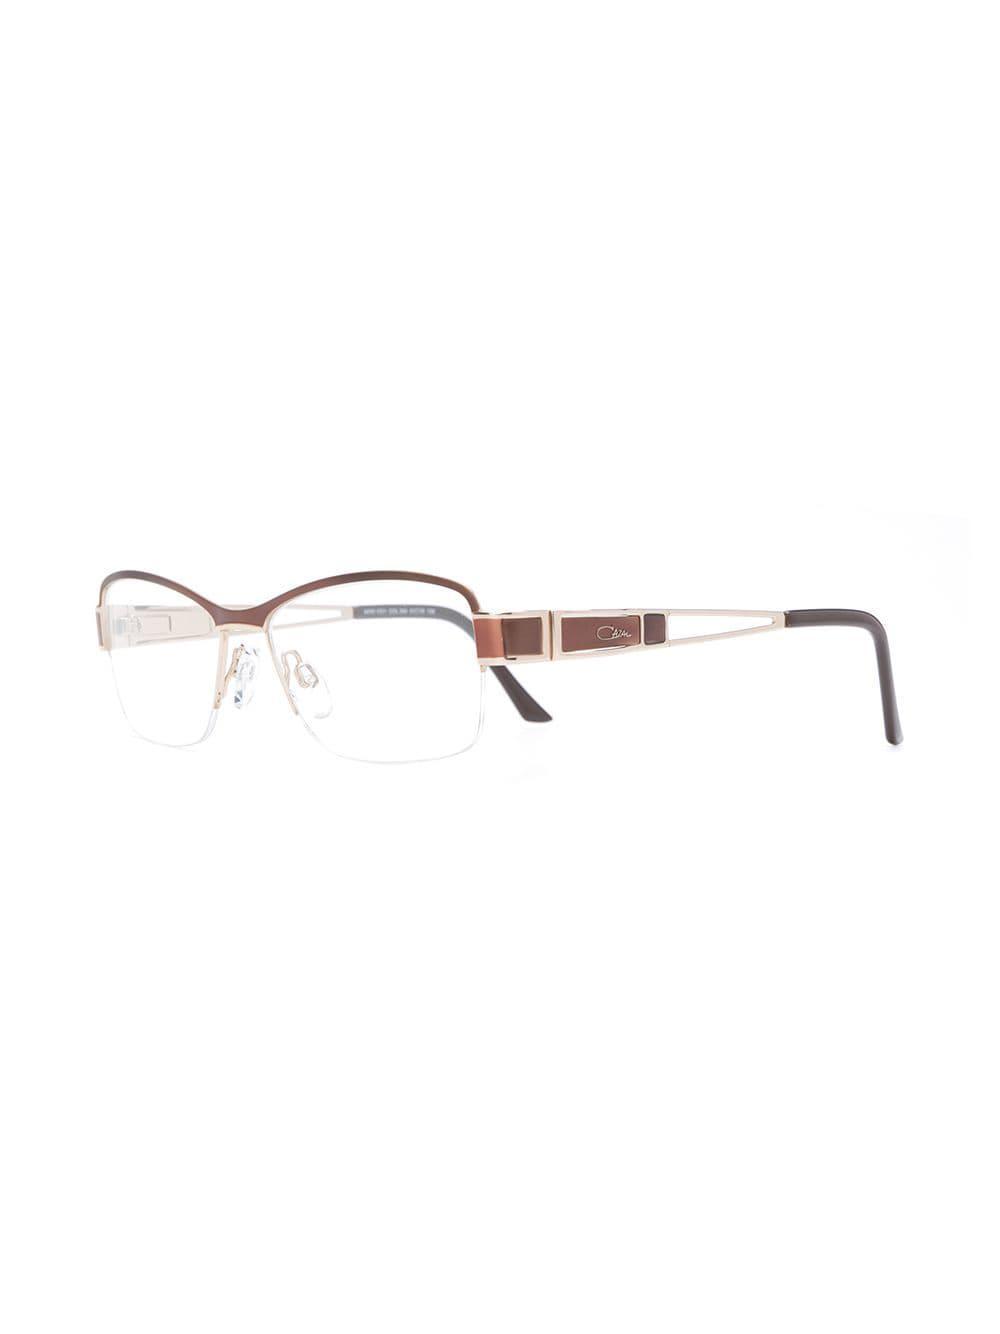 Cazal Rectangle Frame Glasses in Brown - Lyst